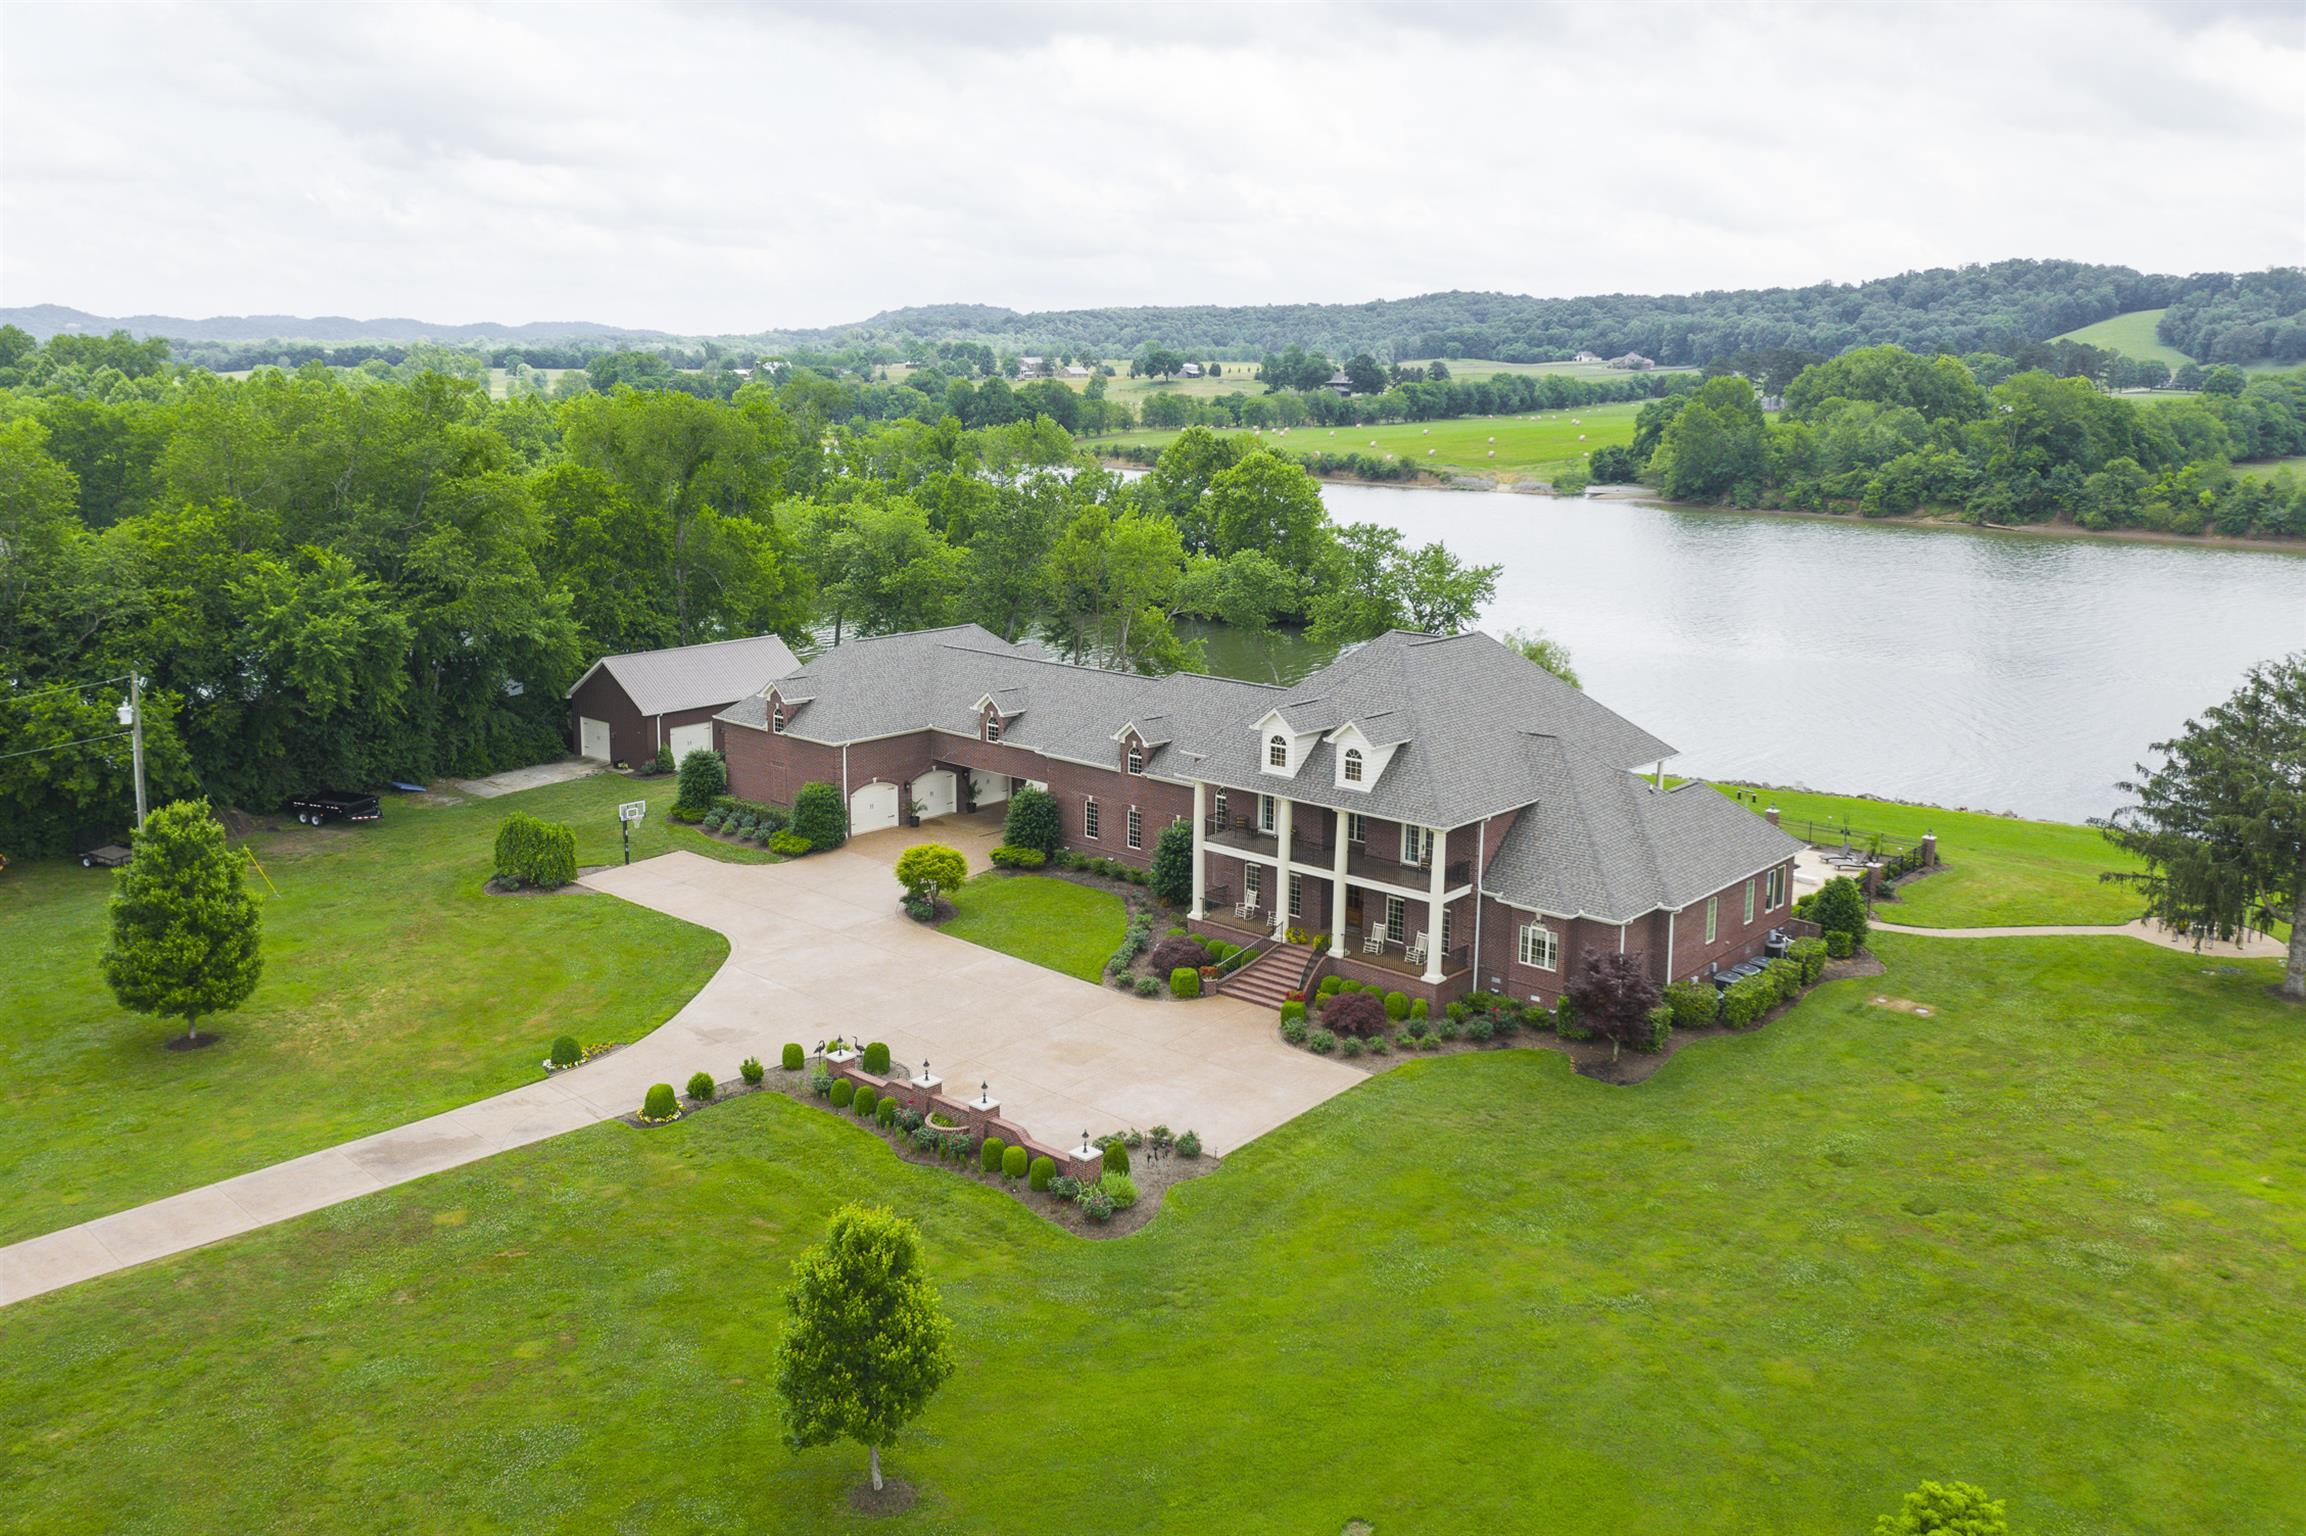 6035 River Trce, Nashville, TN 37218 - Nashville, TN real estate listing